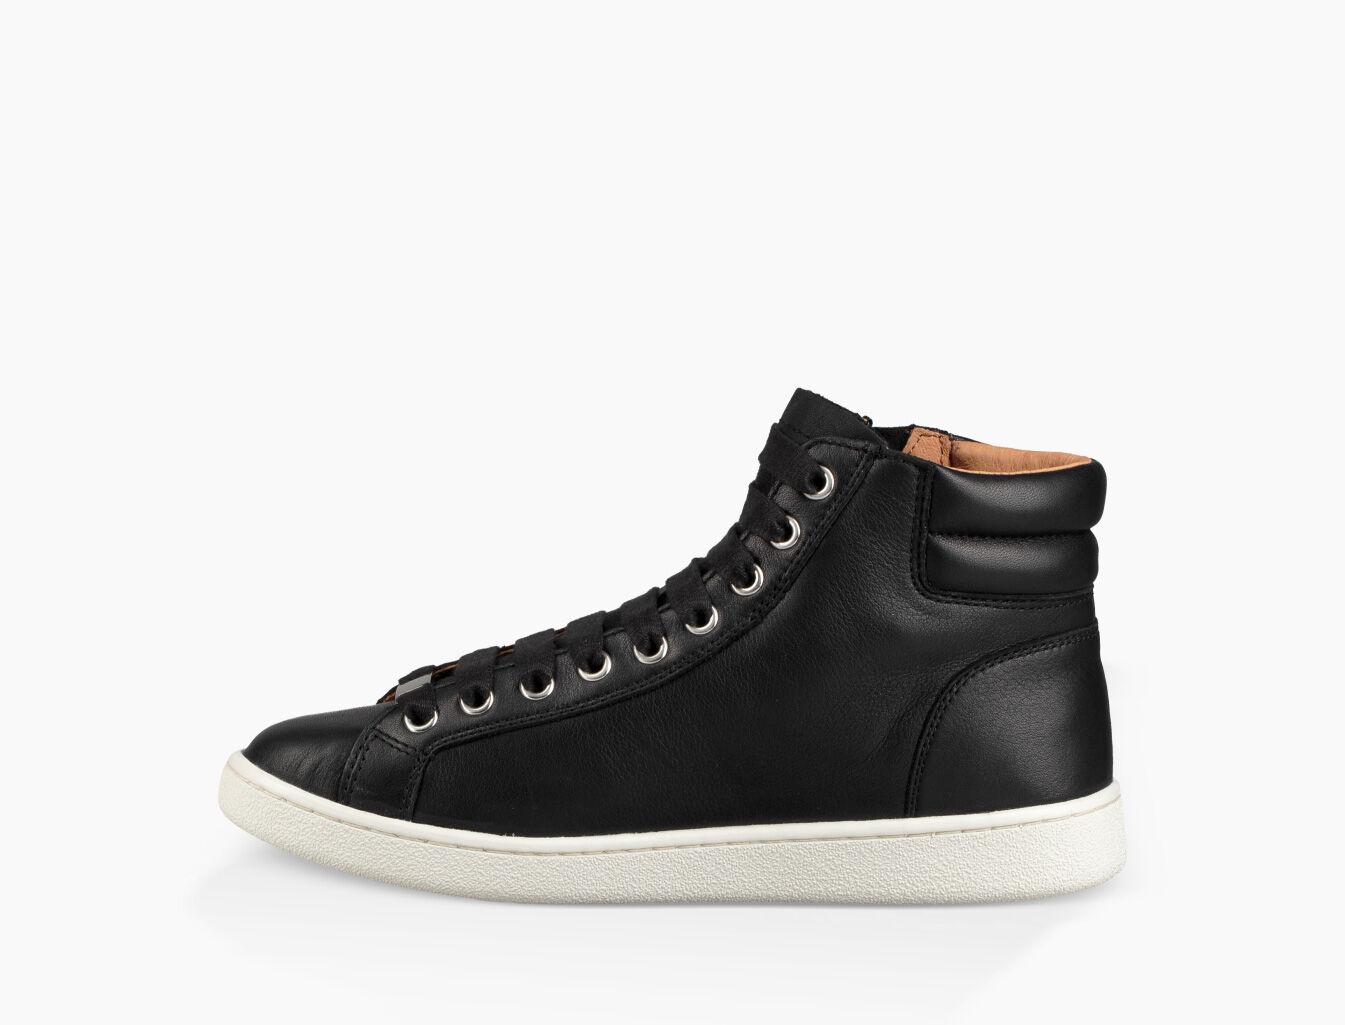 Zoom Olive Sneaker - Image 3 of 6